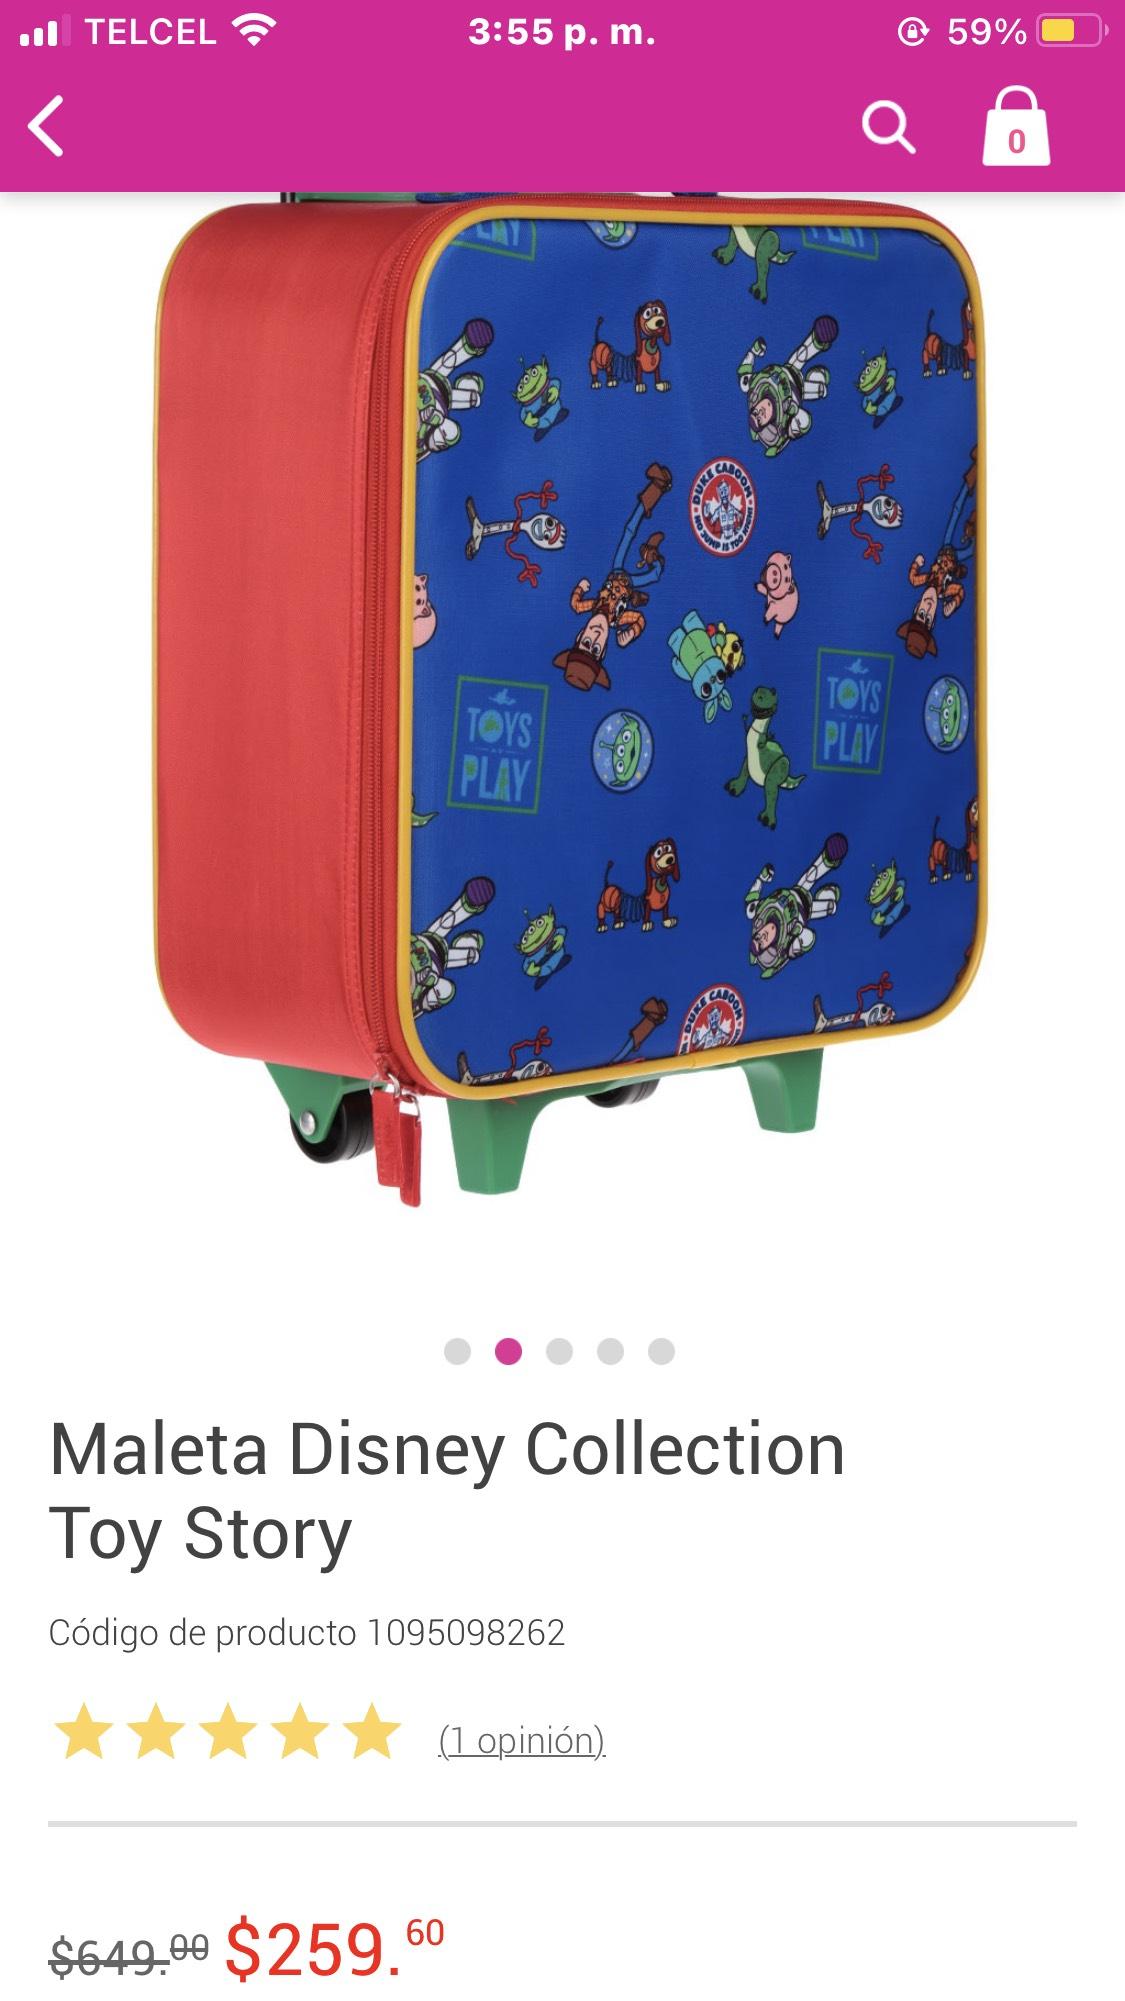 Liverpool: Maleta Toy Story